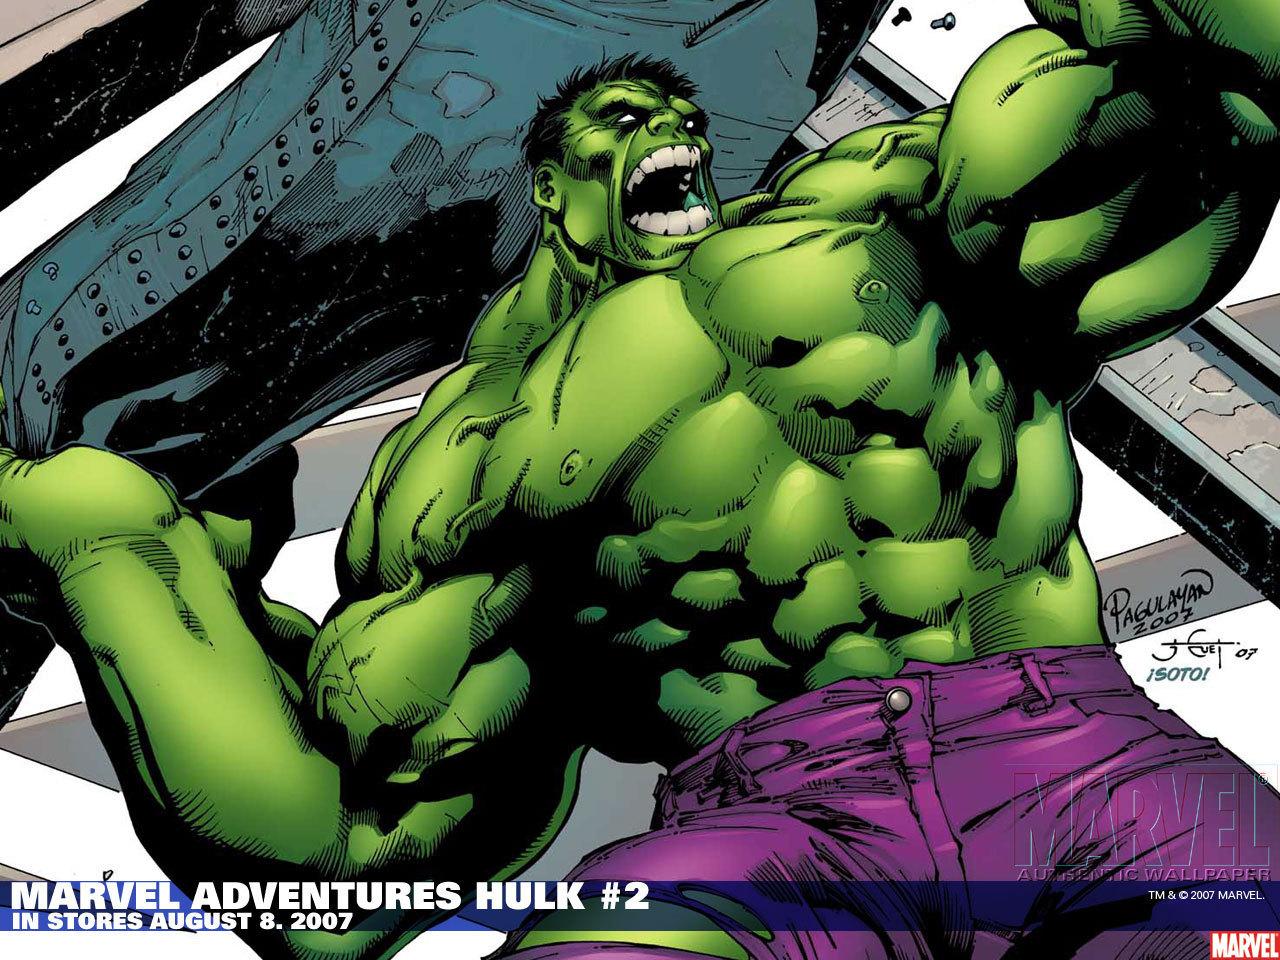 http://images2.fanpop.com/image/photos/14000000/Hulk-the-incredible-hulk-14044617-1280-960.jpg